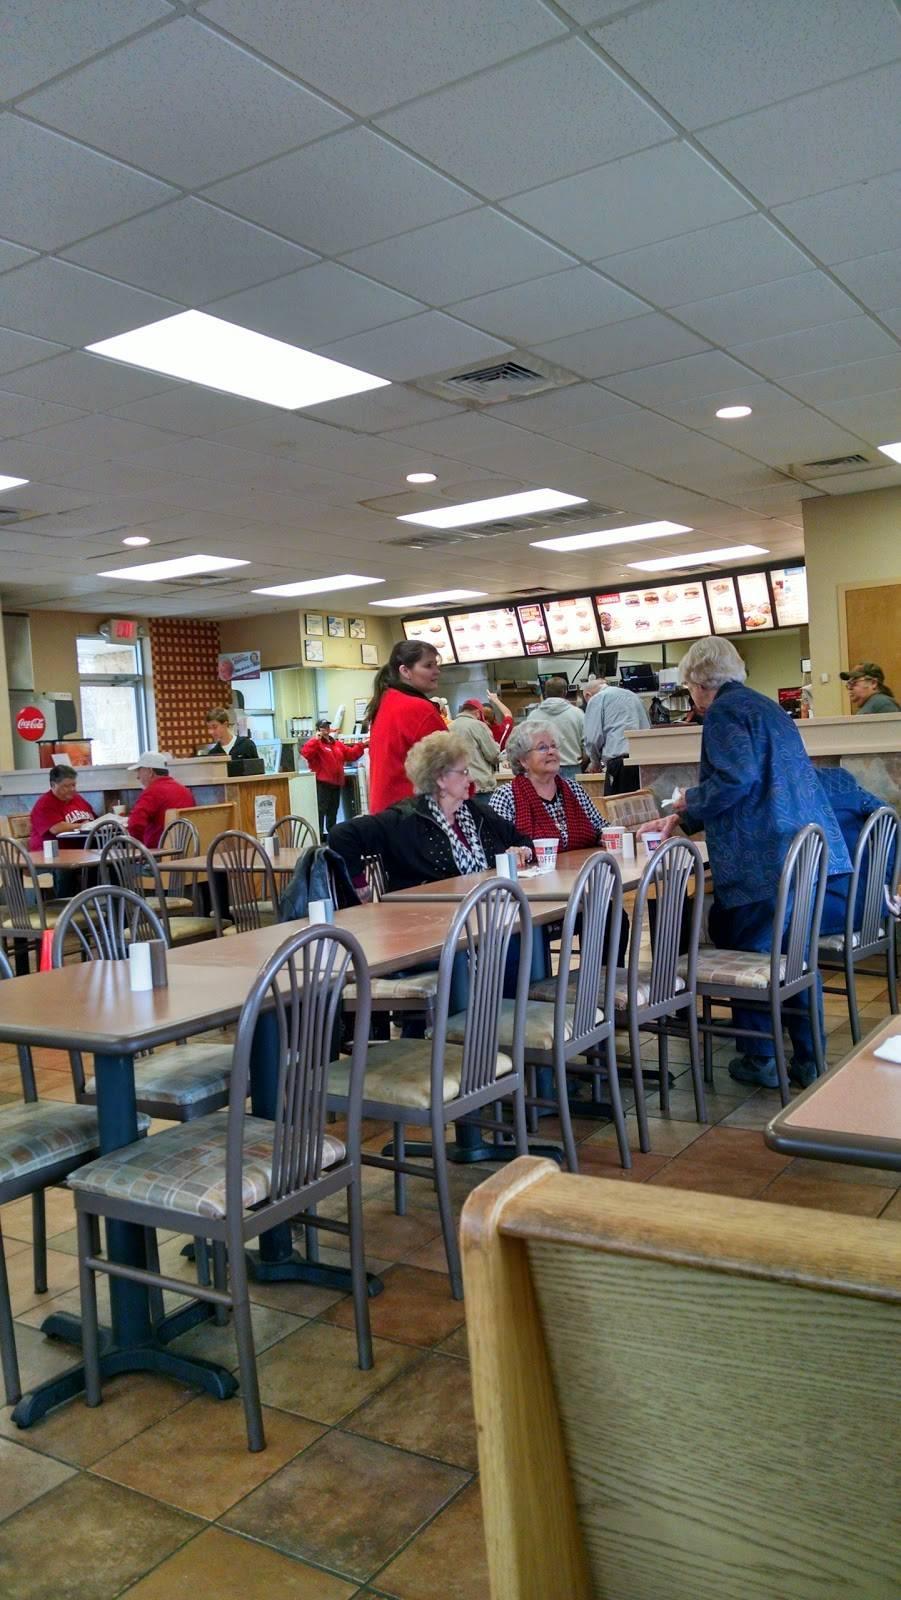 Jacks   restaurant   43023 US-72, Stevenson, AL 35772, USA   2568030090 OR +1 256-803-0090